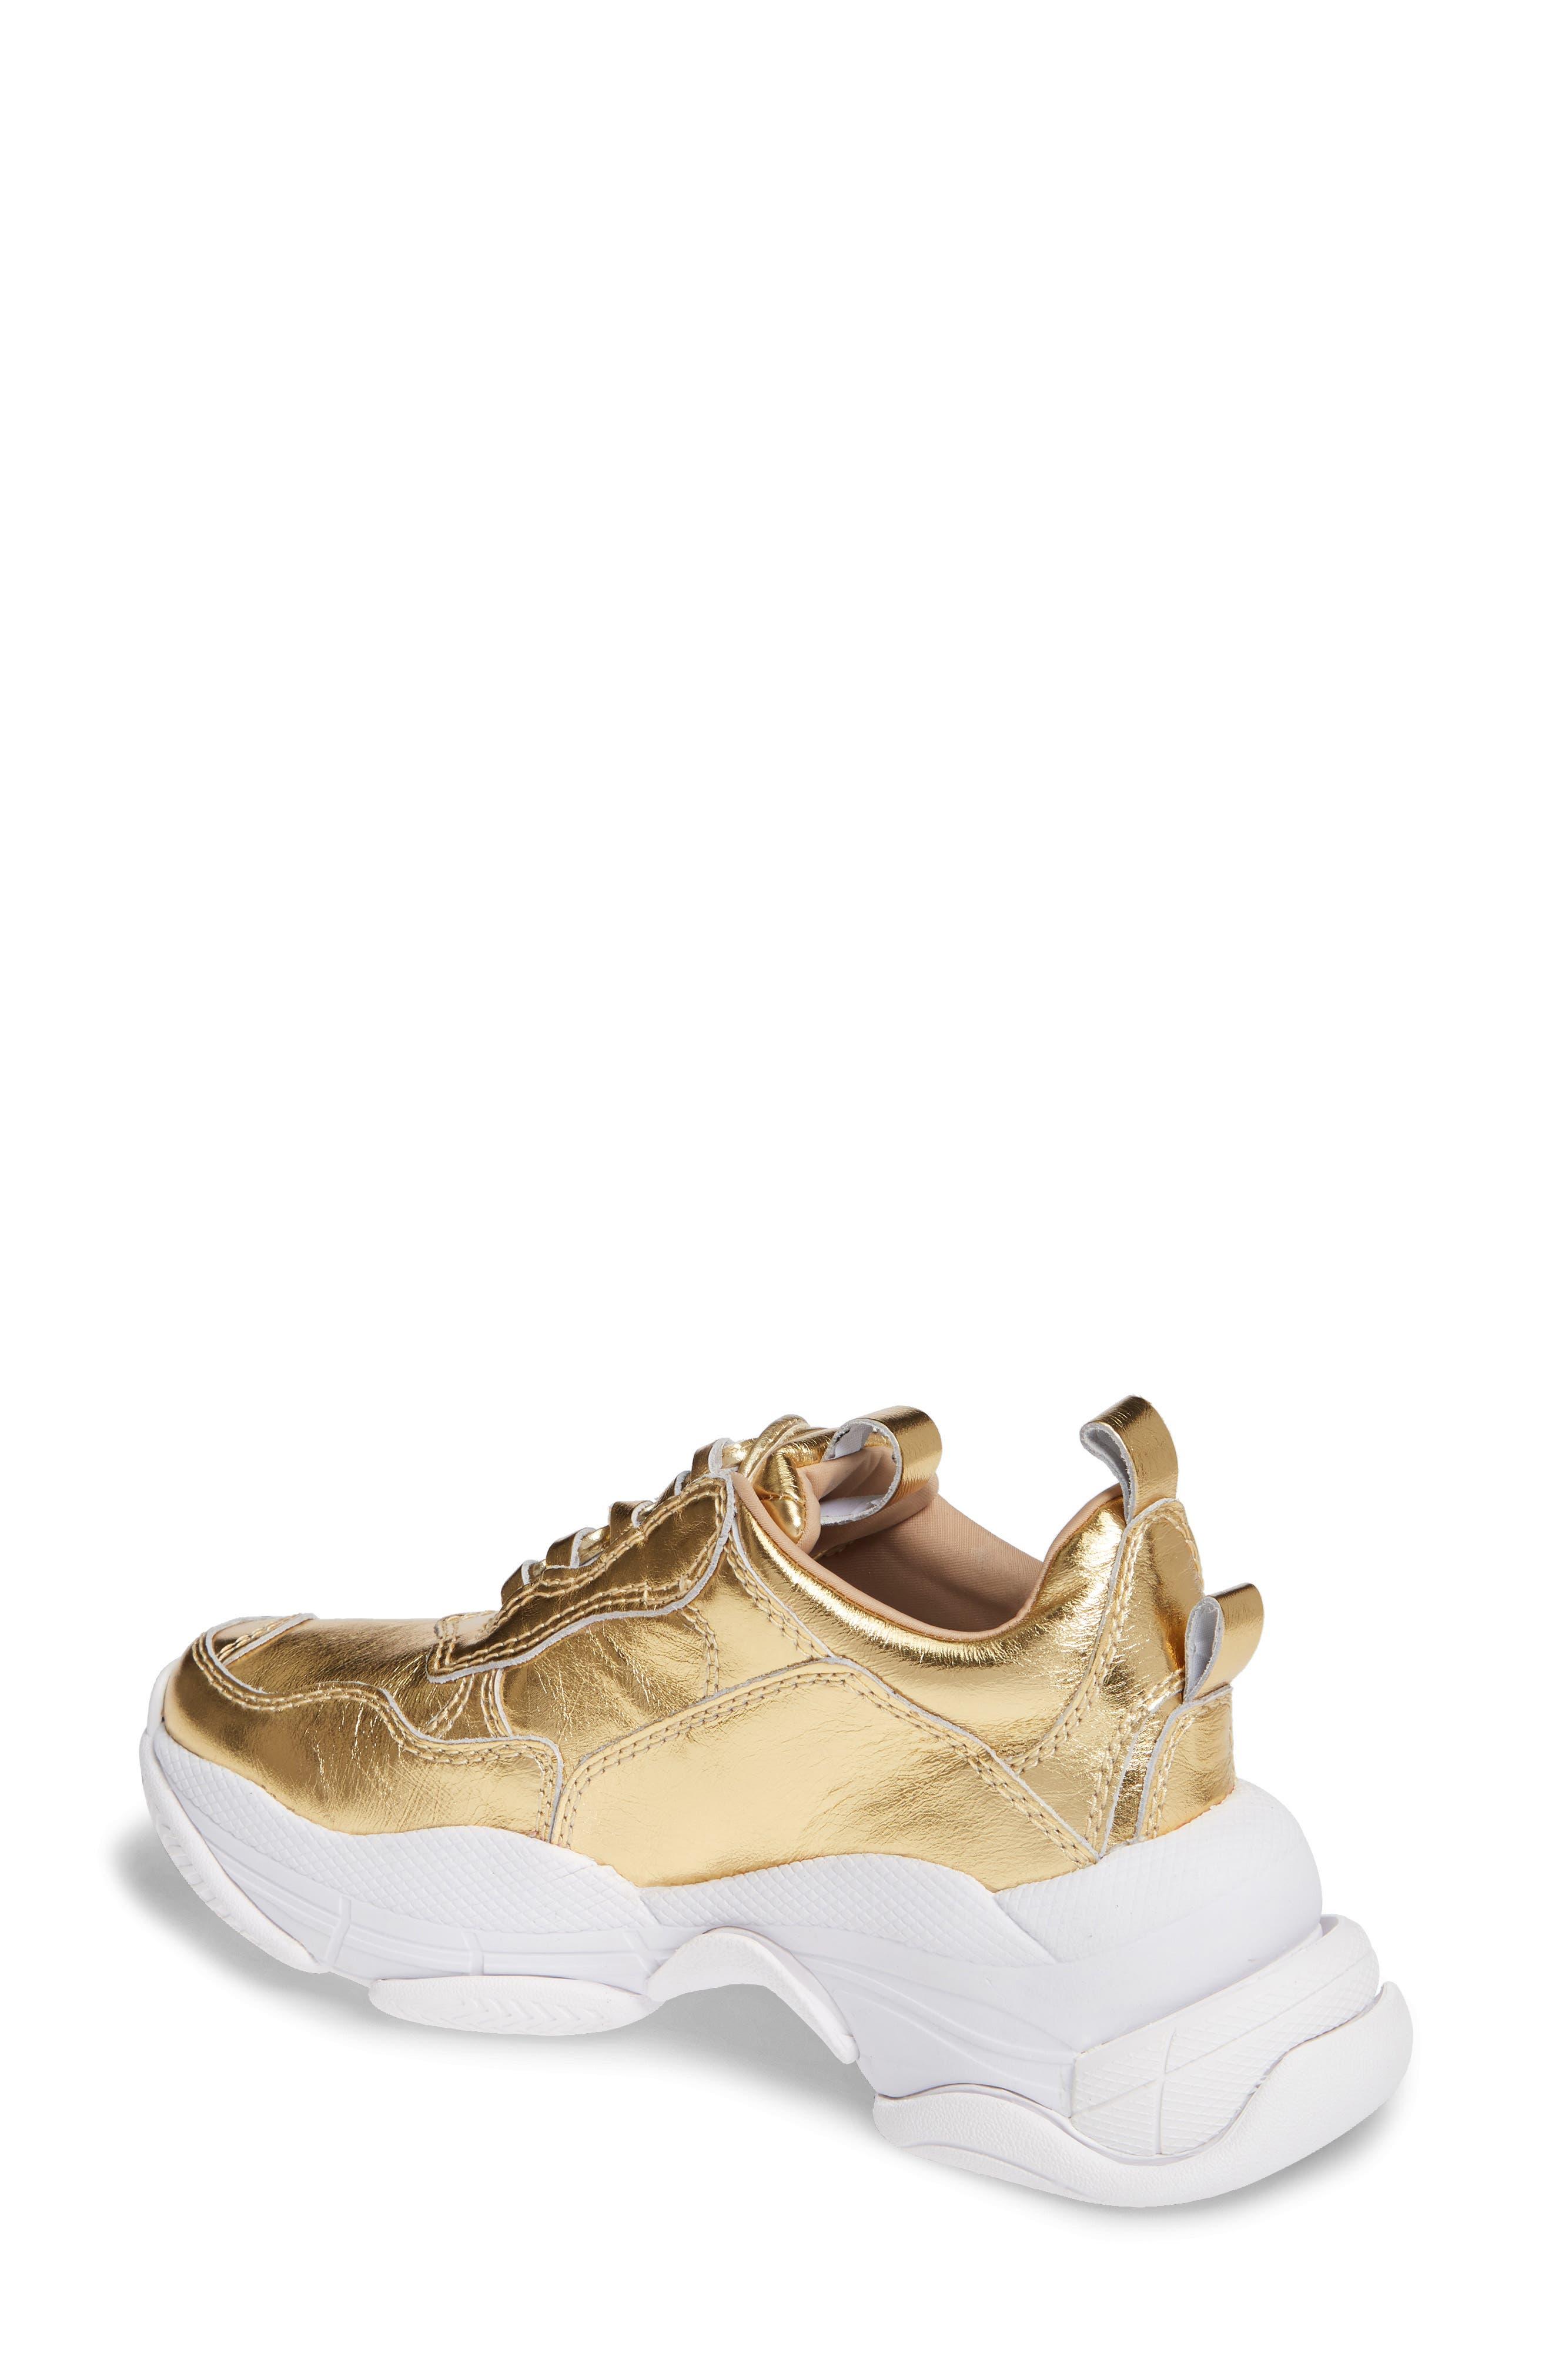 Lo-Fi Sneaker,                             Alternate thumbnail 2, color,                             GOLD CRINKLE